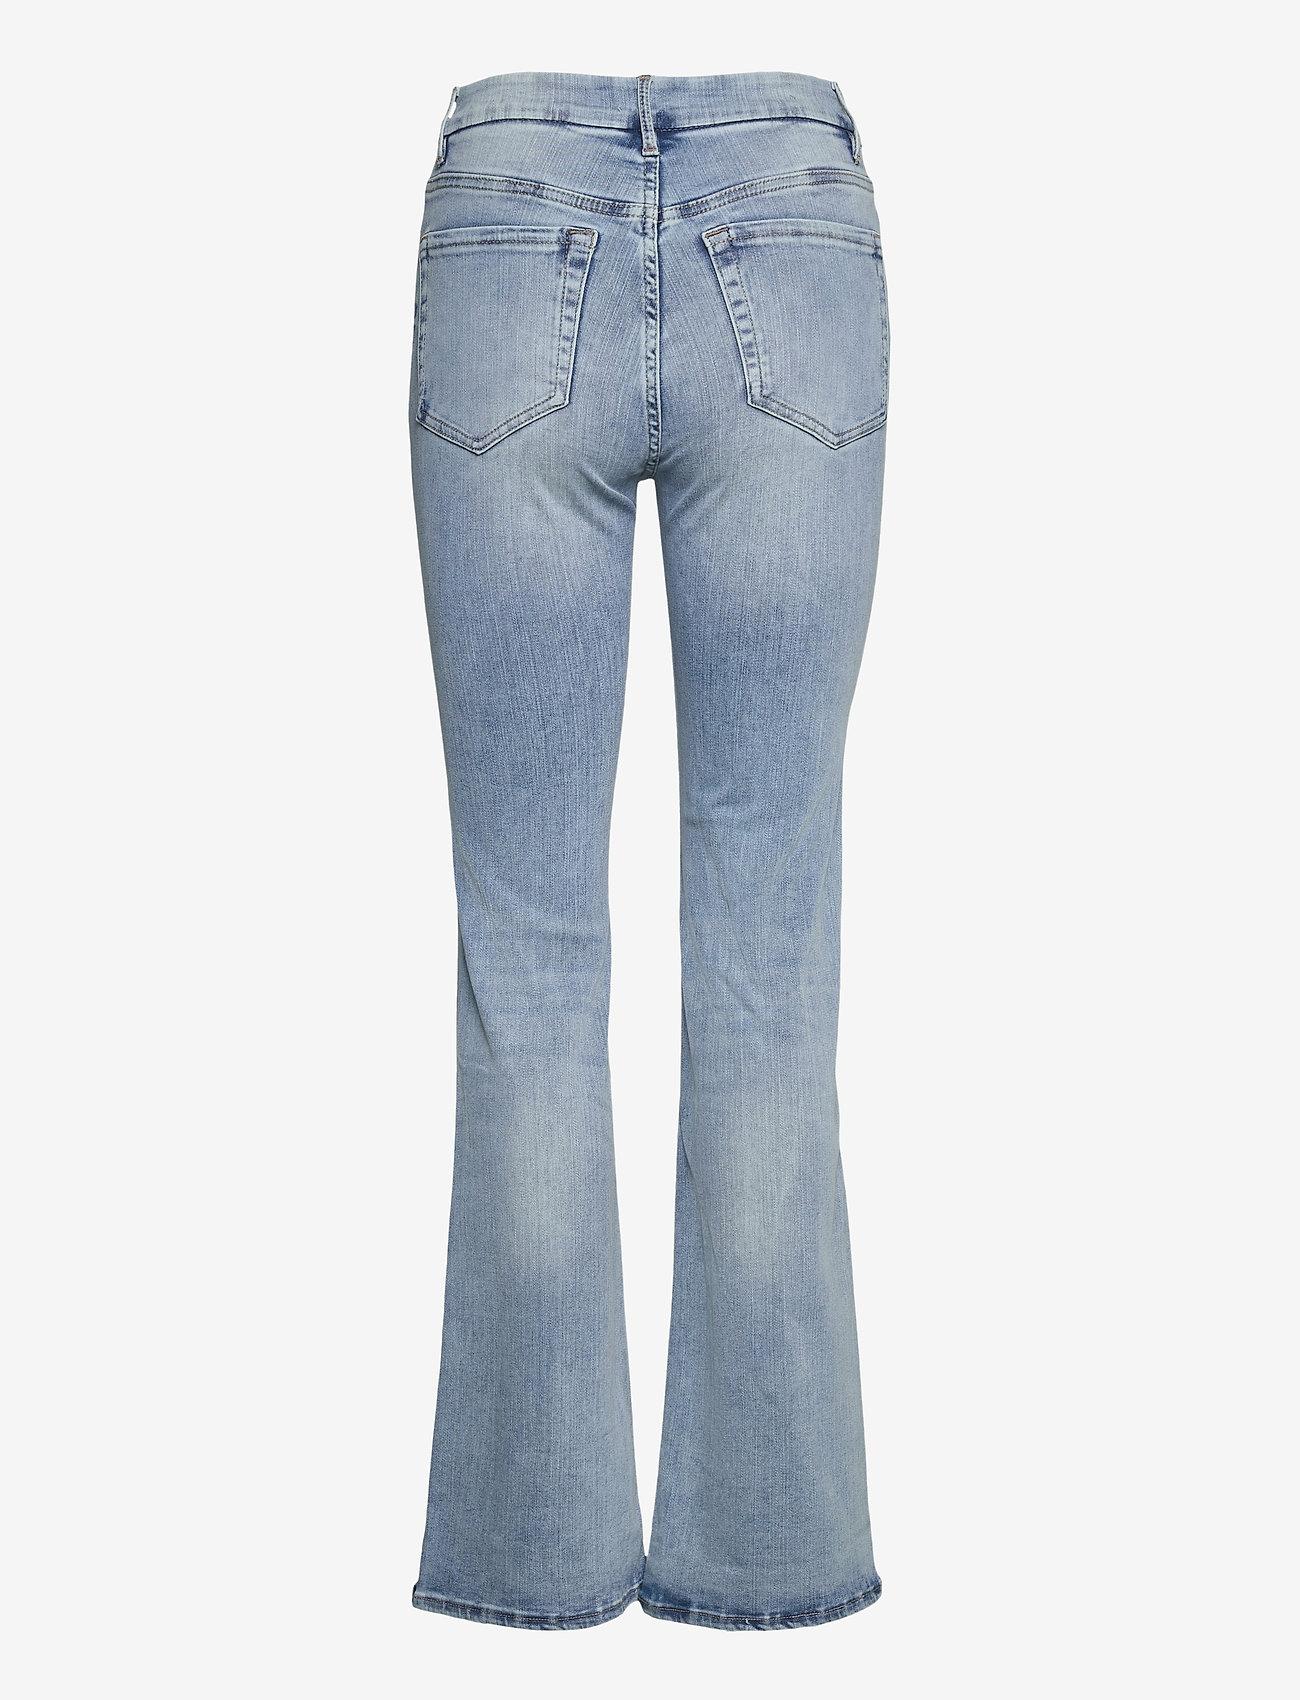 Lindex - Denim trousers Mira lt blue - schlaghosen - blue - 1